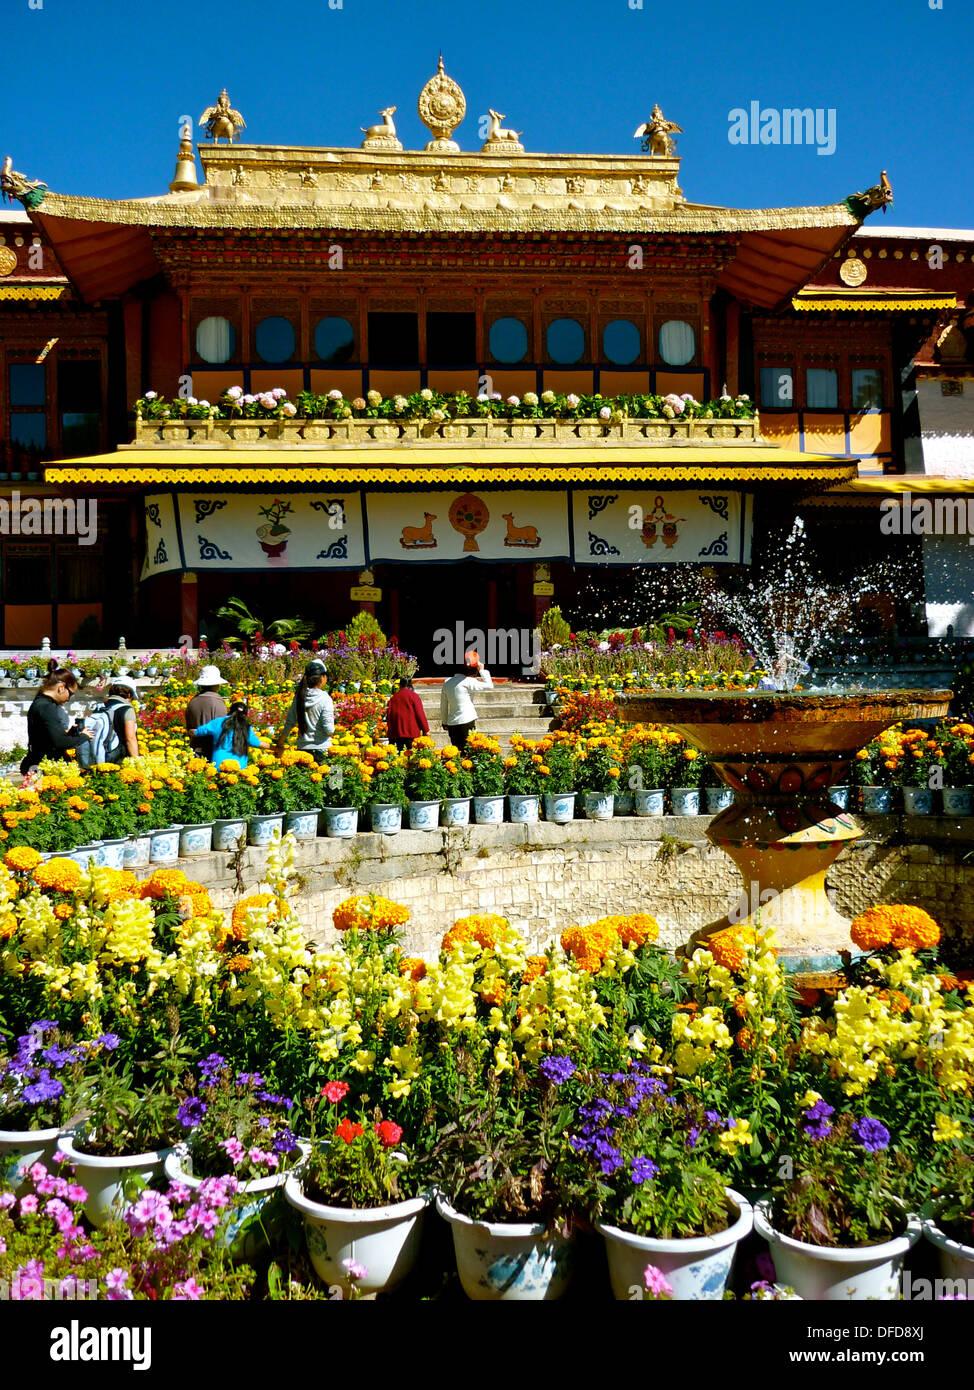 Norbulingka, the Dalai Lama's Summer Palace in Lhasa, Tibet - Stock Image